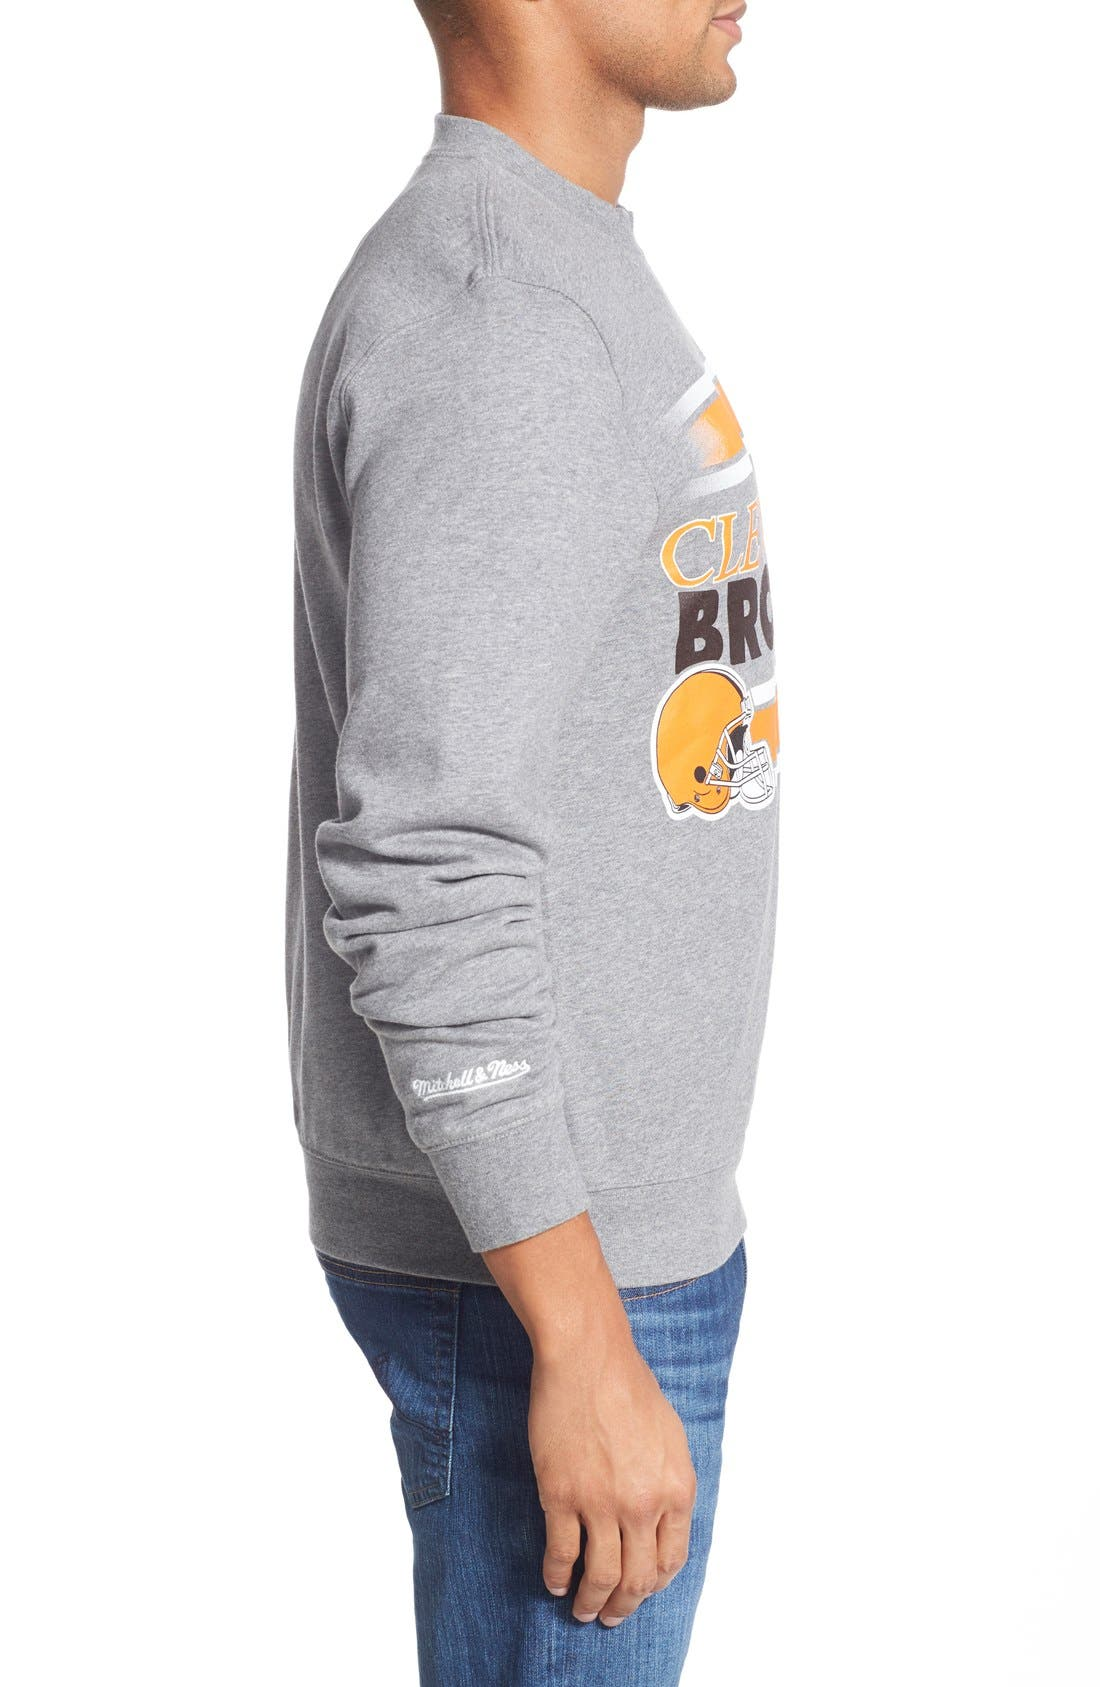 MITCHELL & NESS,                             Mitchell &Ness'Cleveland Browns' Tailored Fleece Crewneck Sweatshirt,                             Alternate thumbnail 3, color,                             061